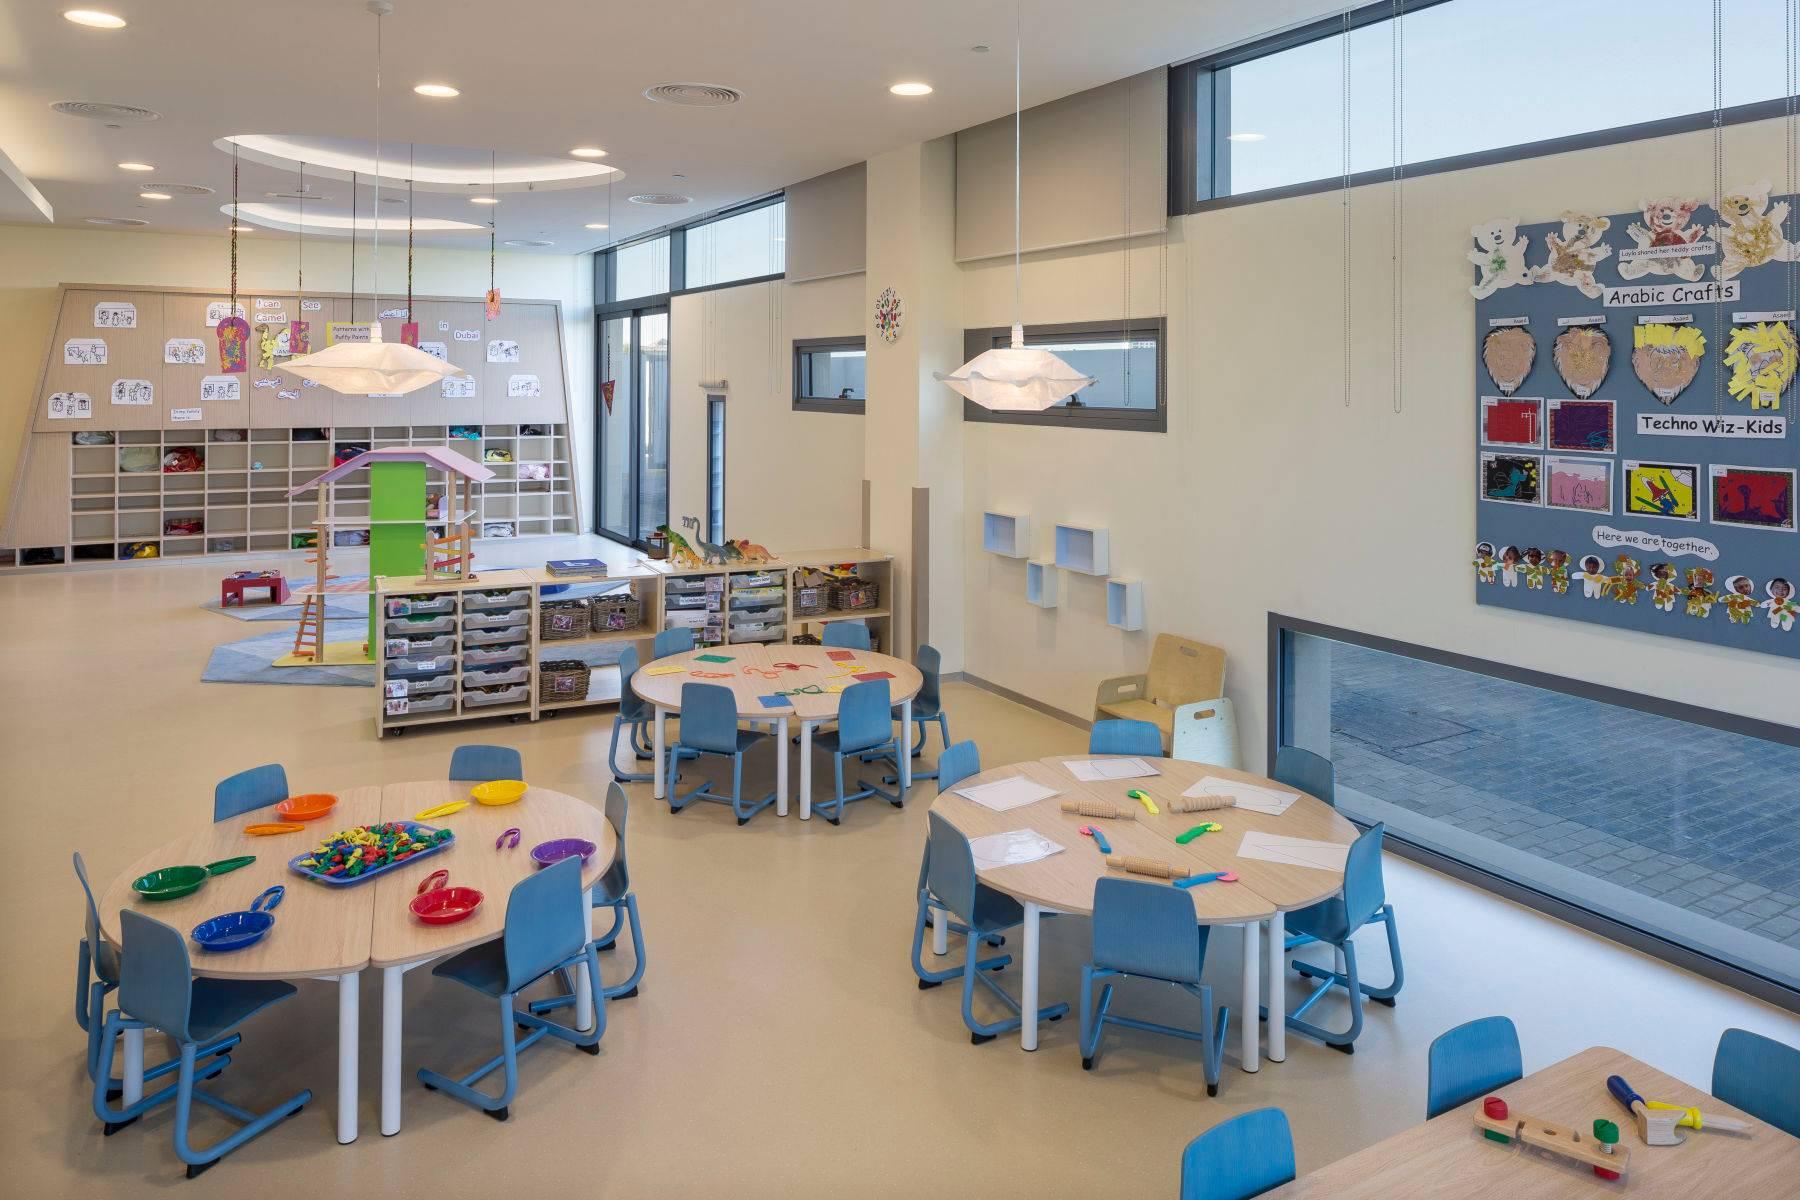 1gems_al_barsha_classroom.jpg